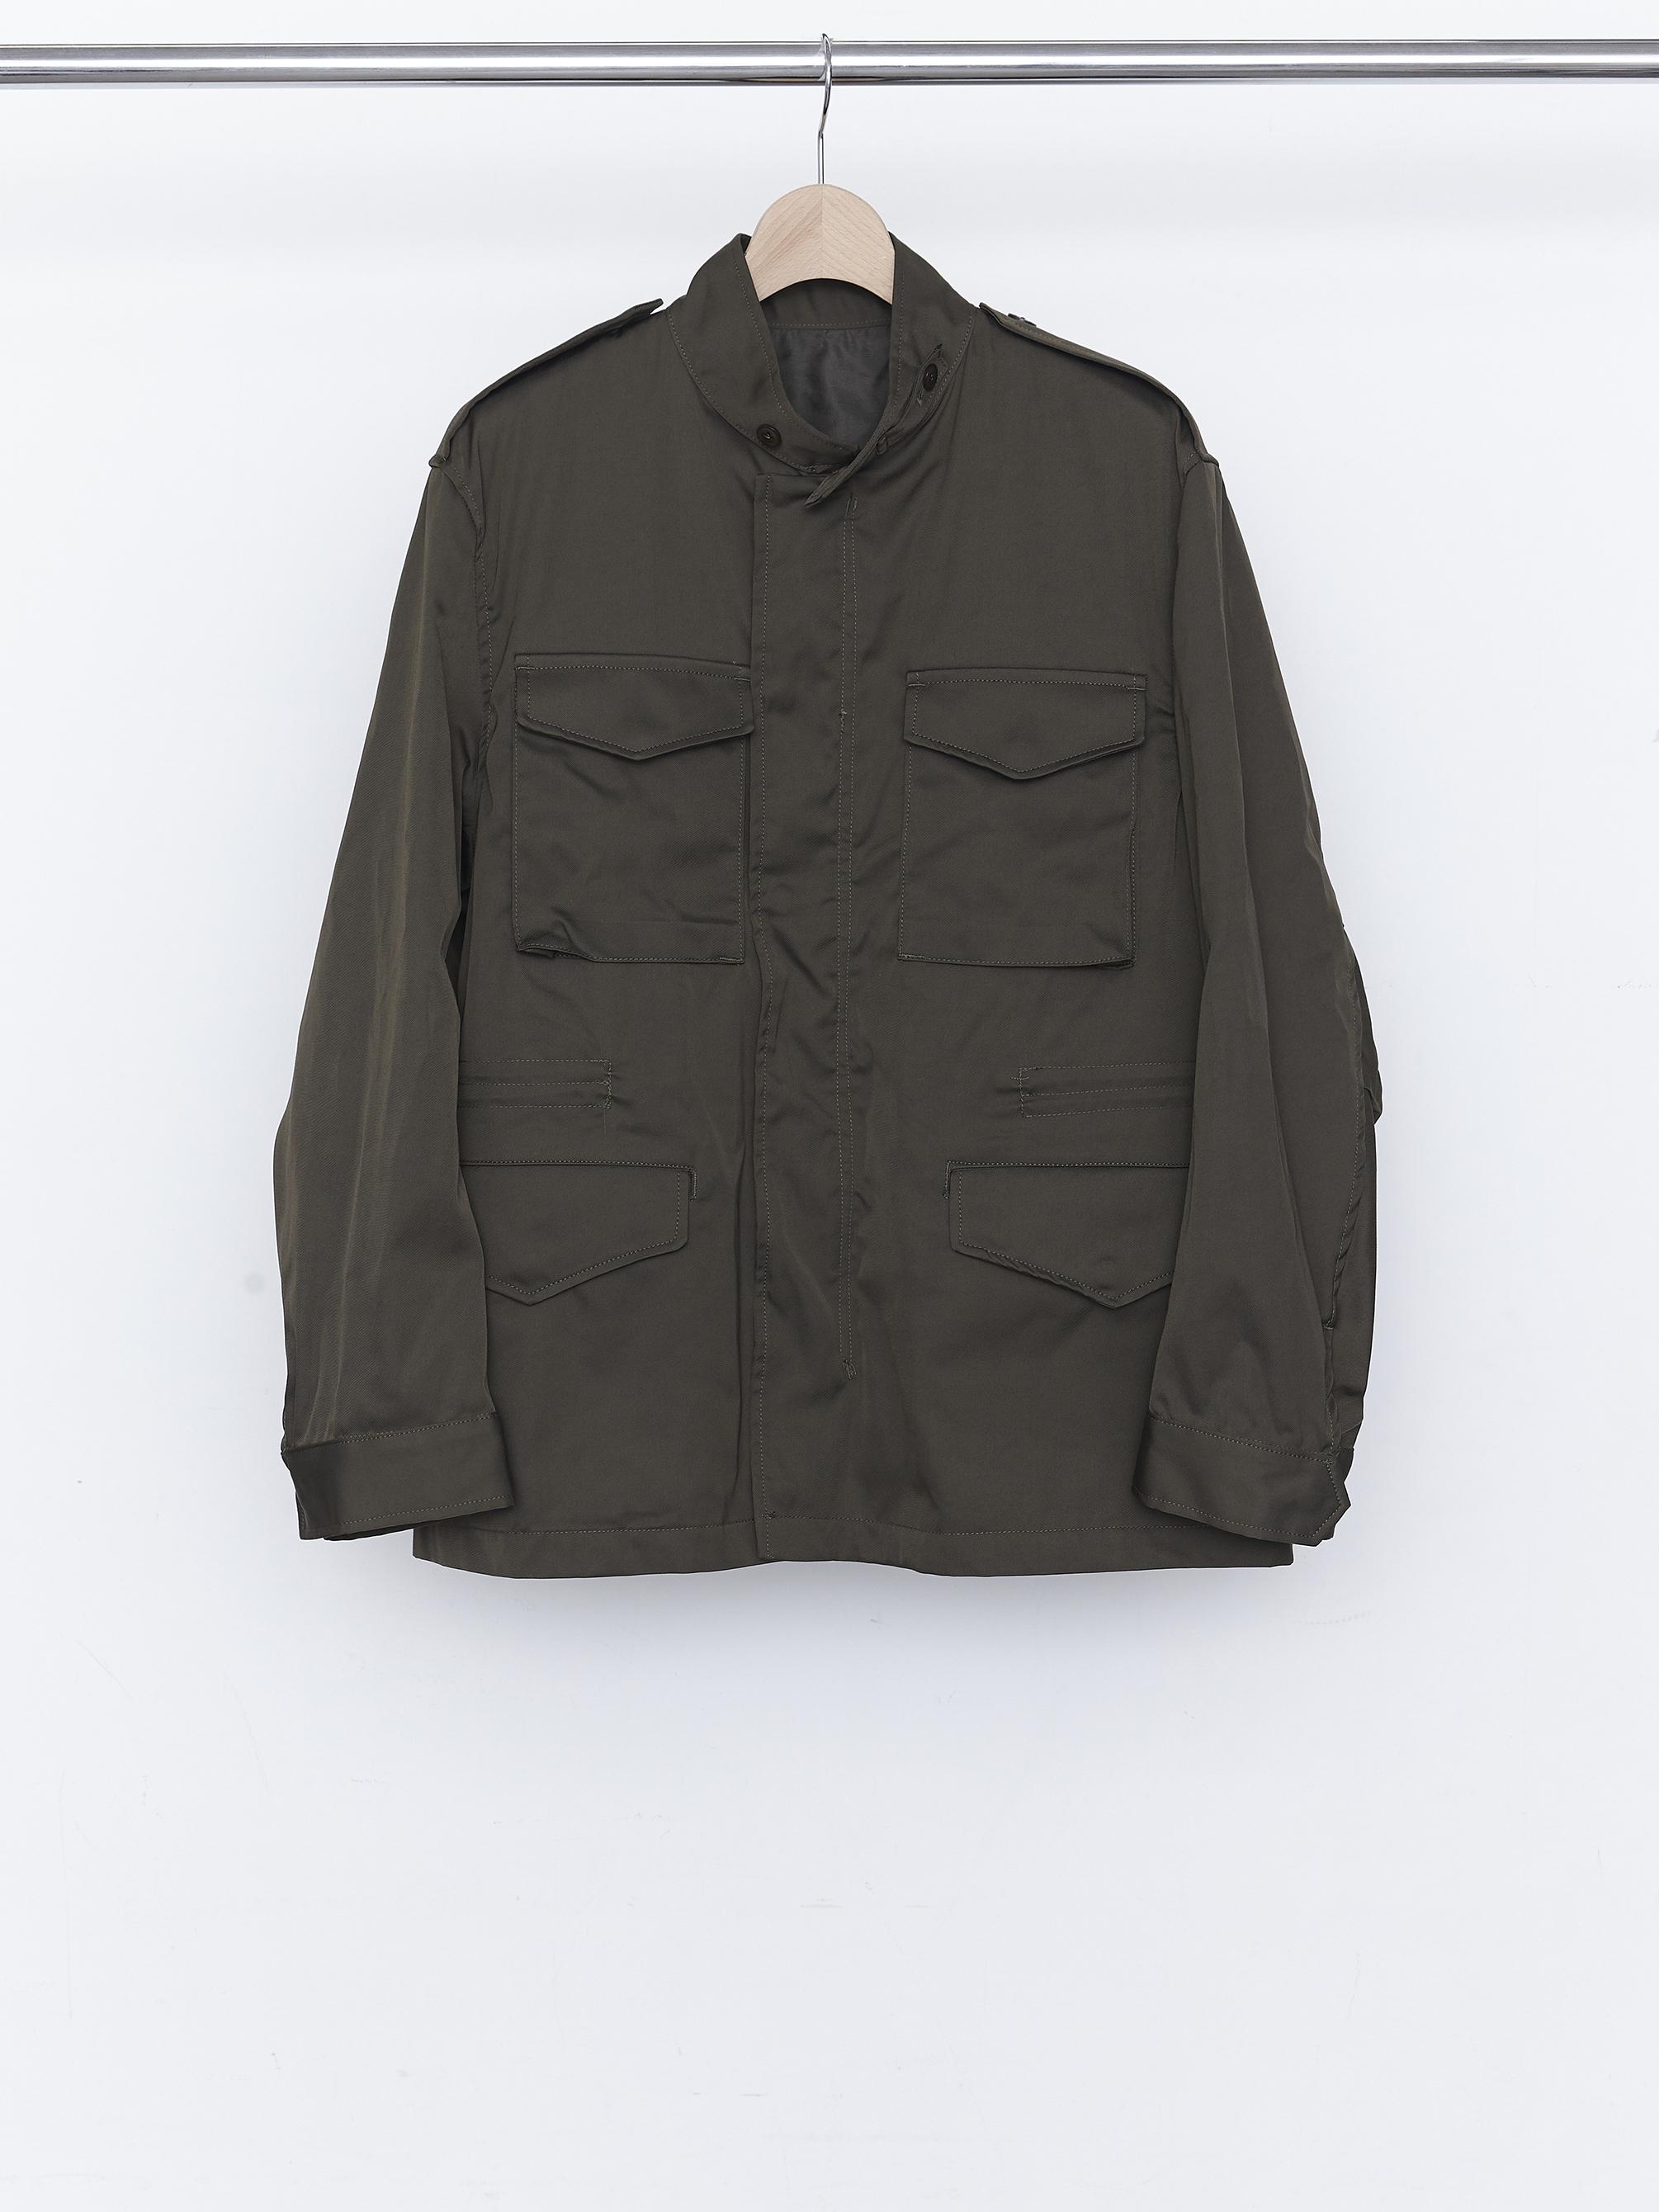 Military Jacket - Khaki